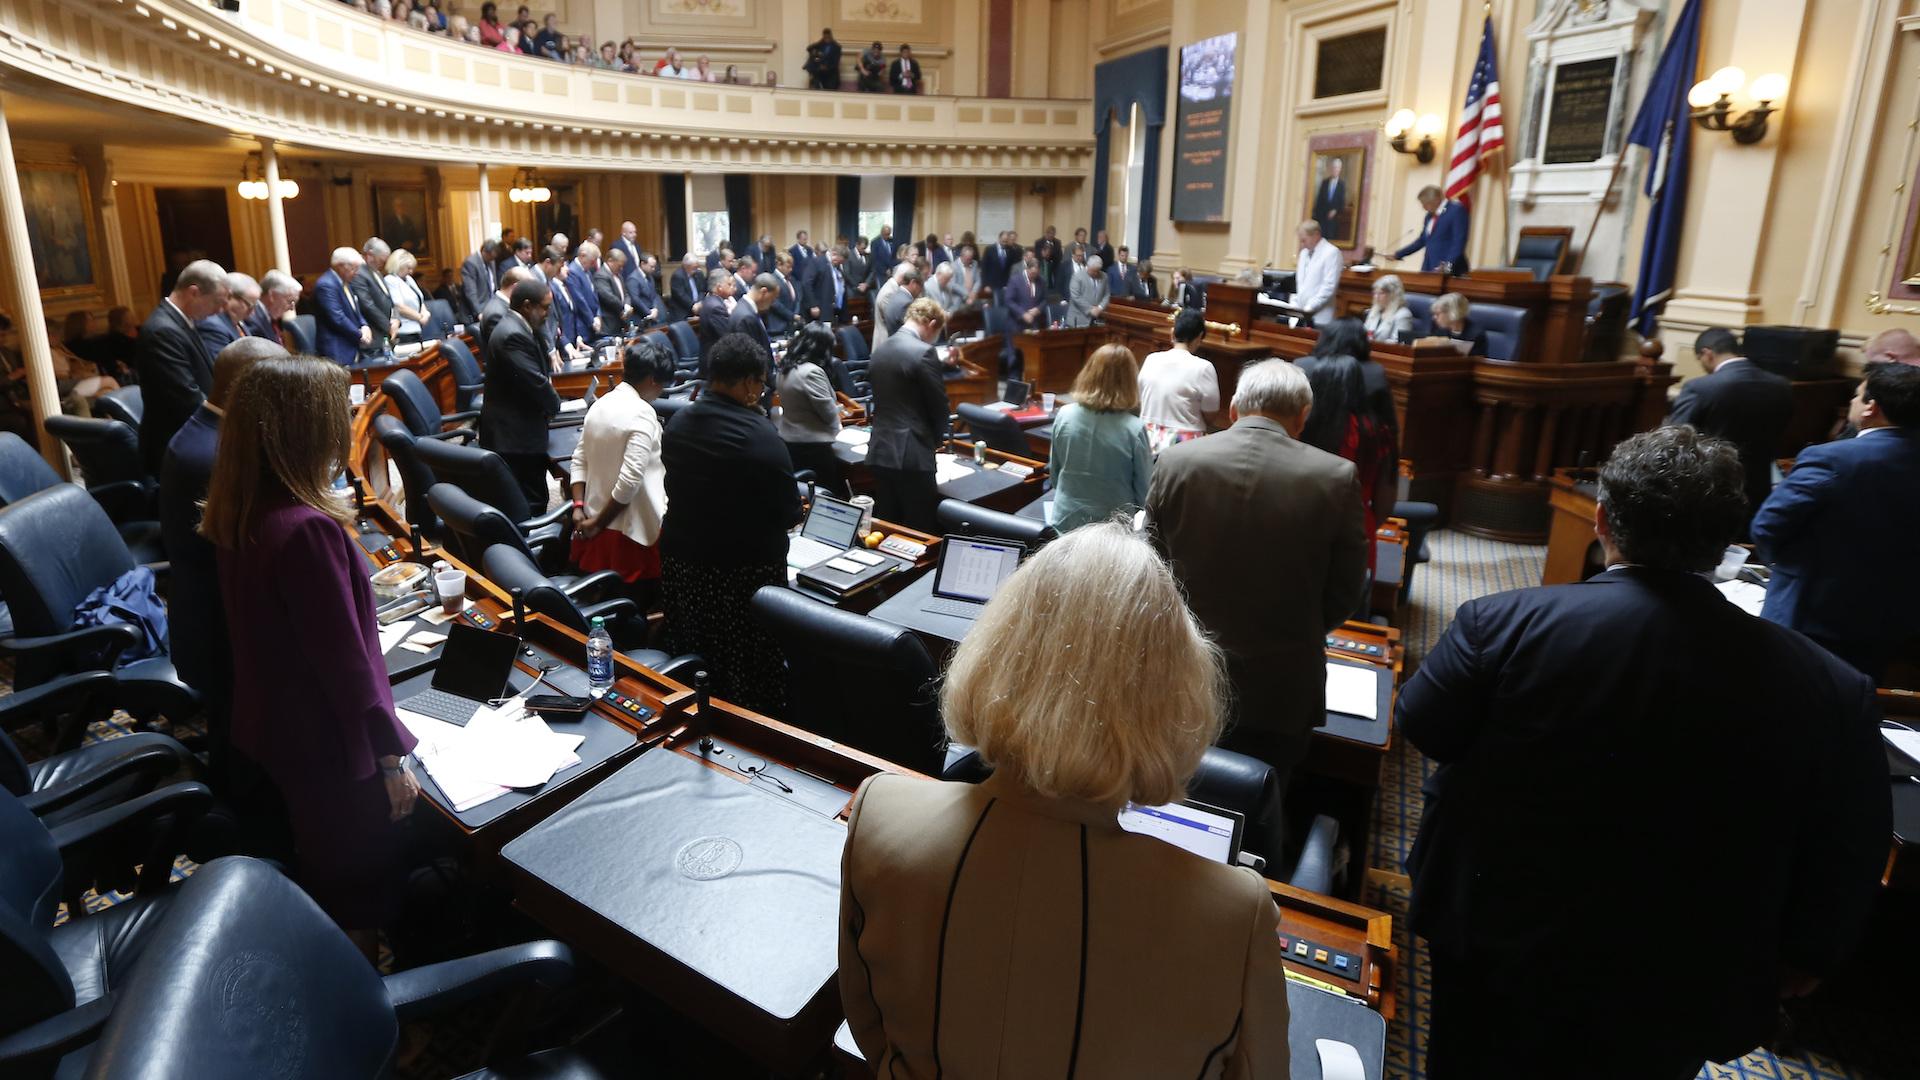 Gun debate ends abruptly in Virginia as GOP-controlled legislature adjourns after 90 minutes